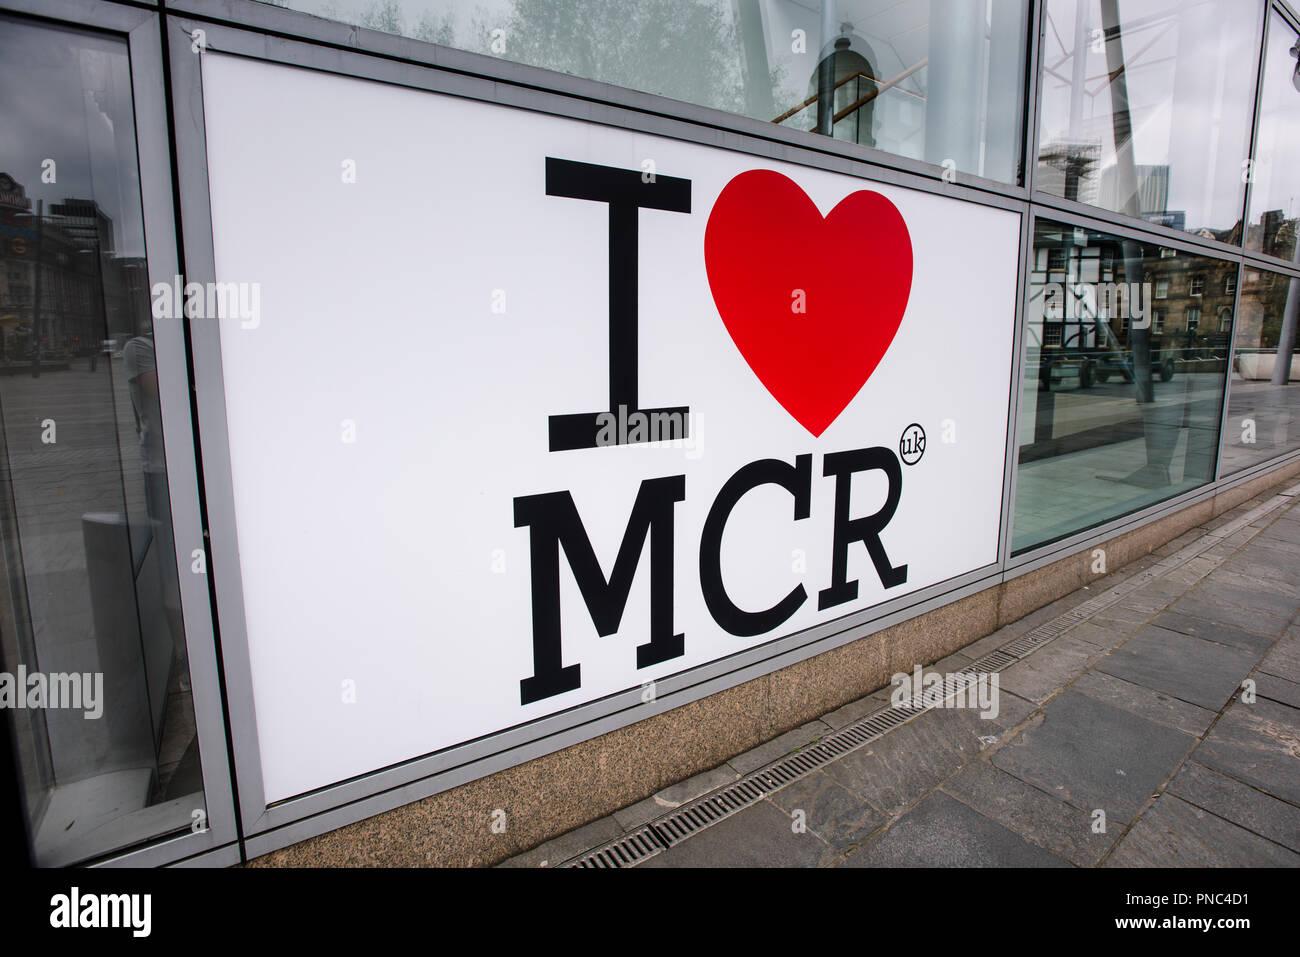 I LOVE MCR - Stock Image